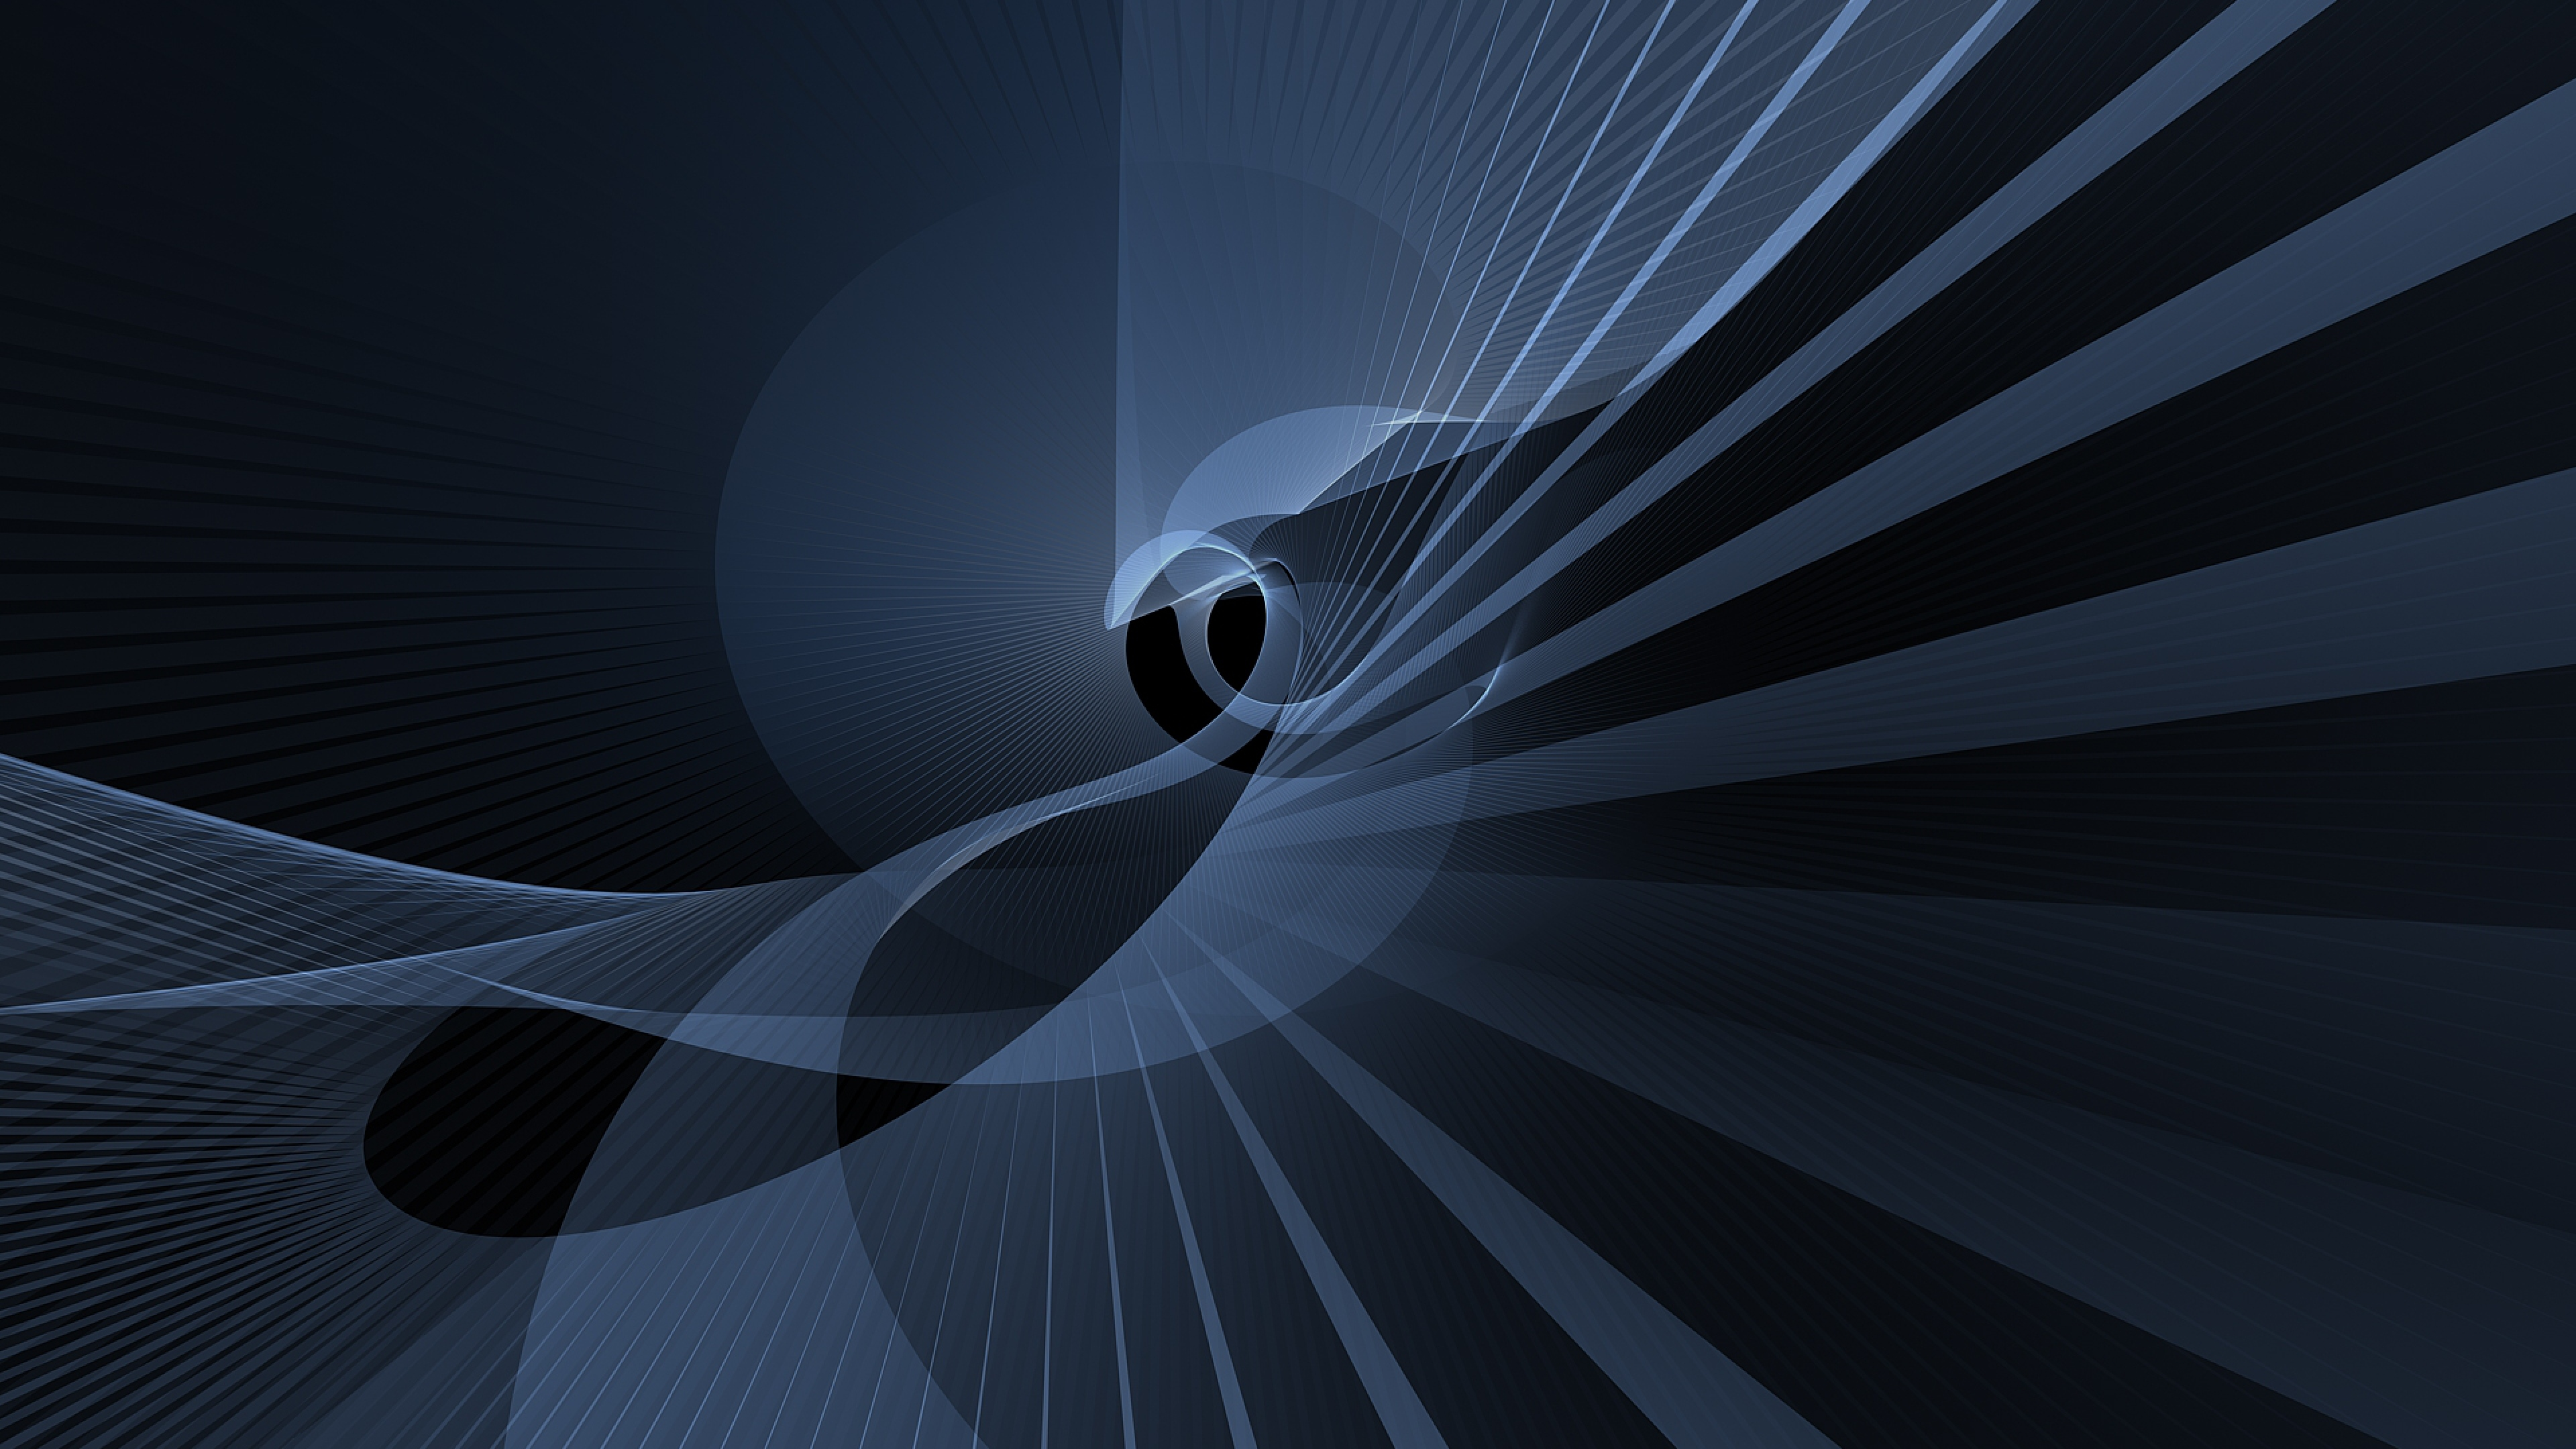 Wallpaper 3840x2160 Abstract Black White 4K Ultra HD HD Background 3840x2160